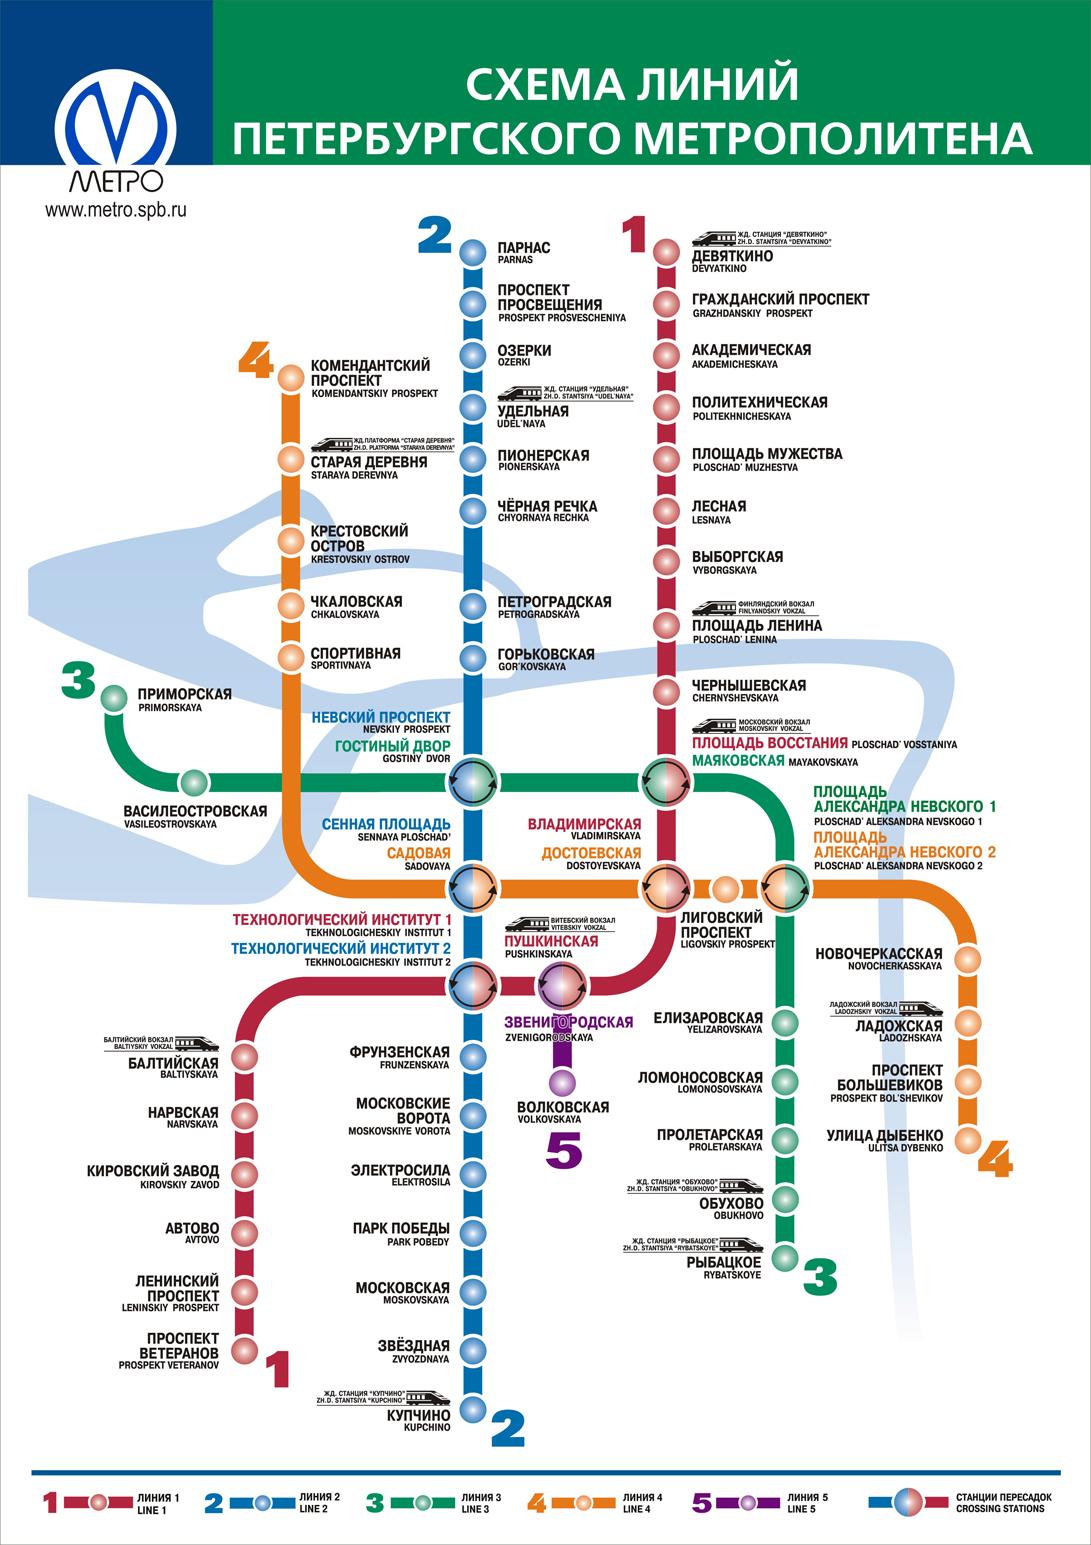 Схема метрополитена санкт-петербург 2015 год